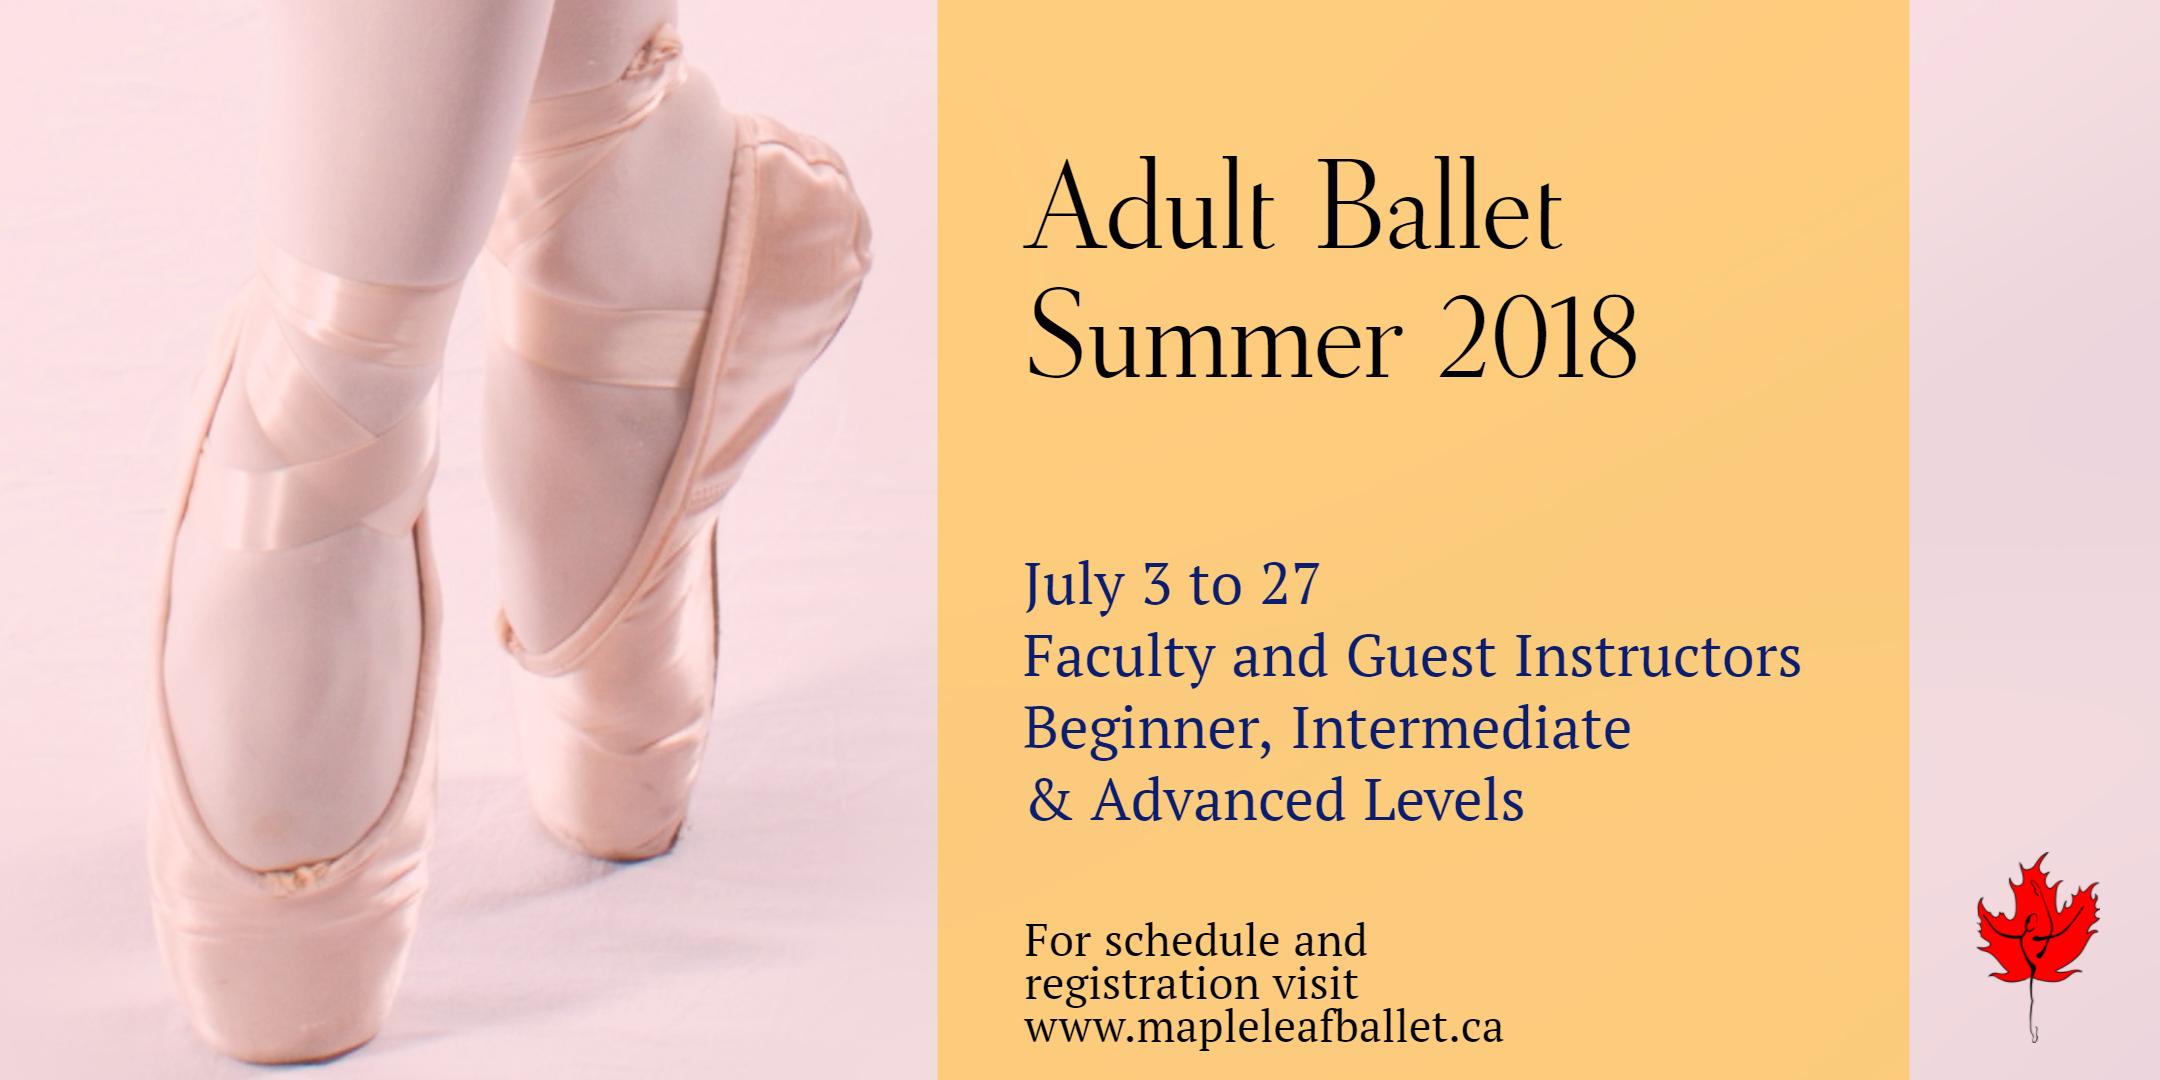 Adult ballet summer 2018